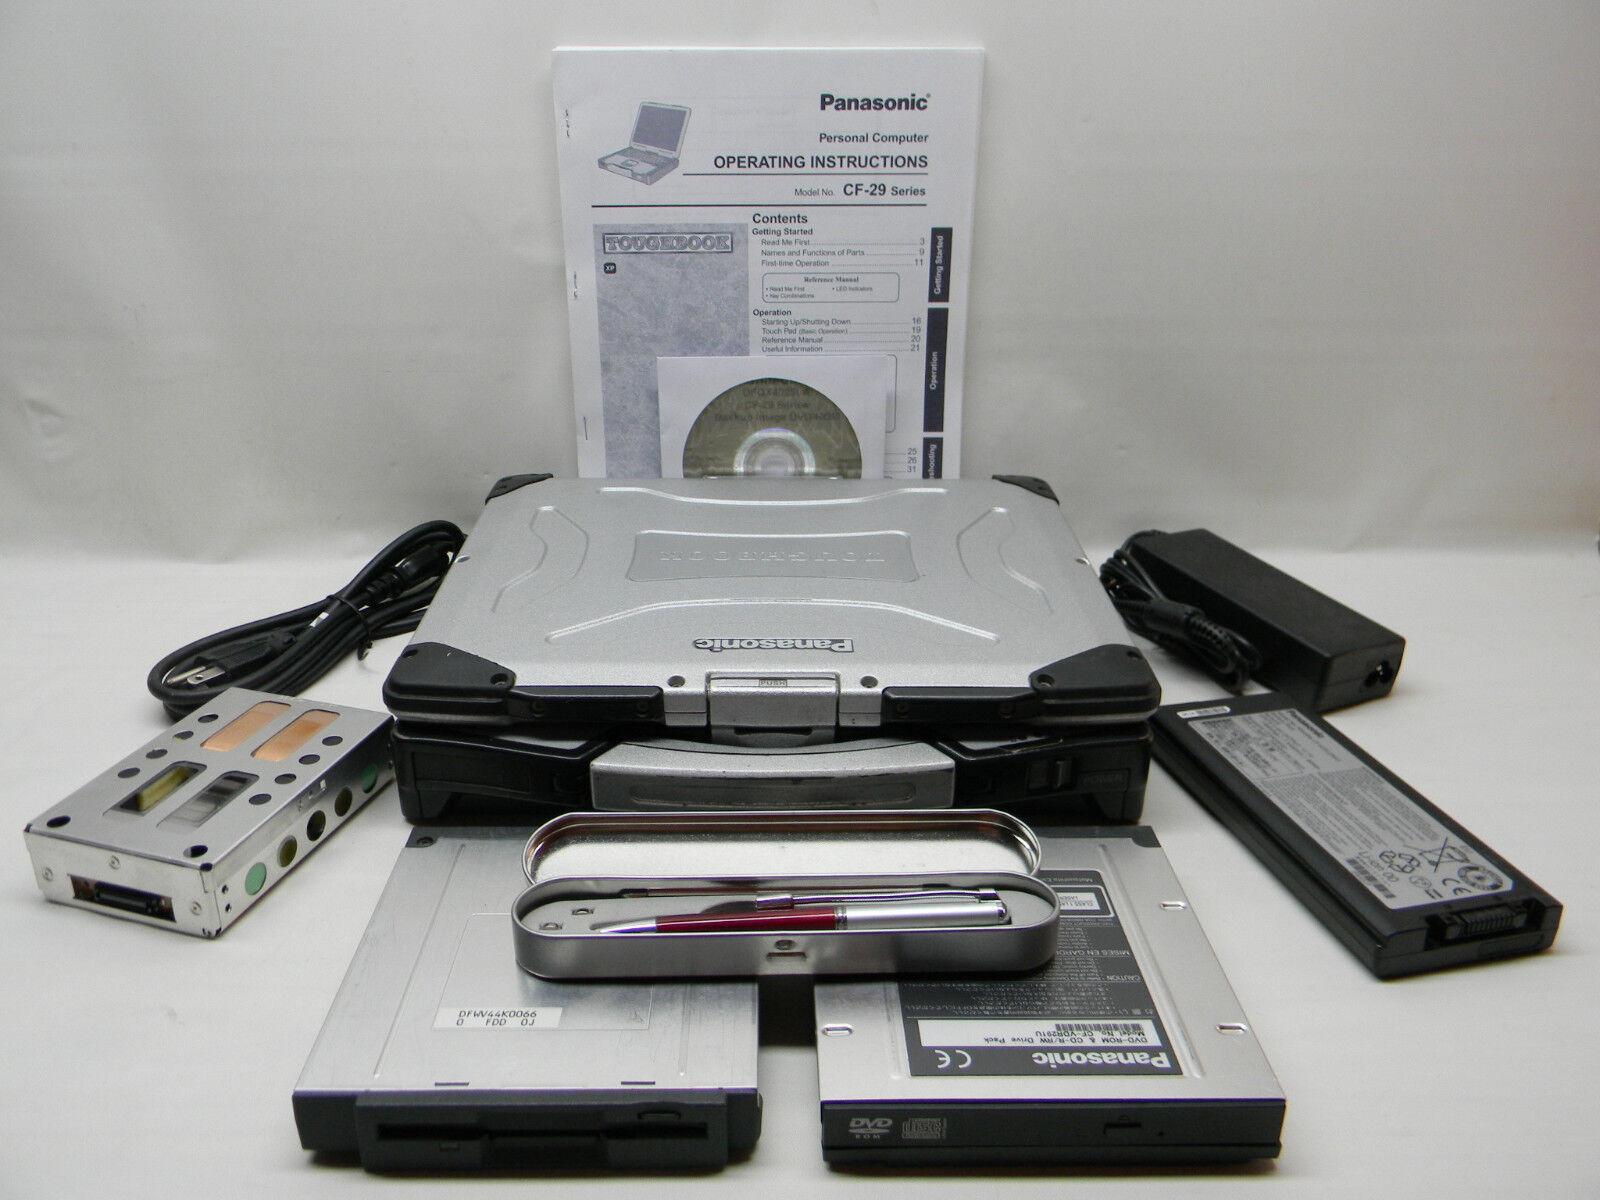 Panasonic Toughbook CF-29 Commercial/Industrial Laptop Touchscreen XP Pro #687